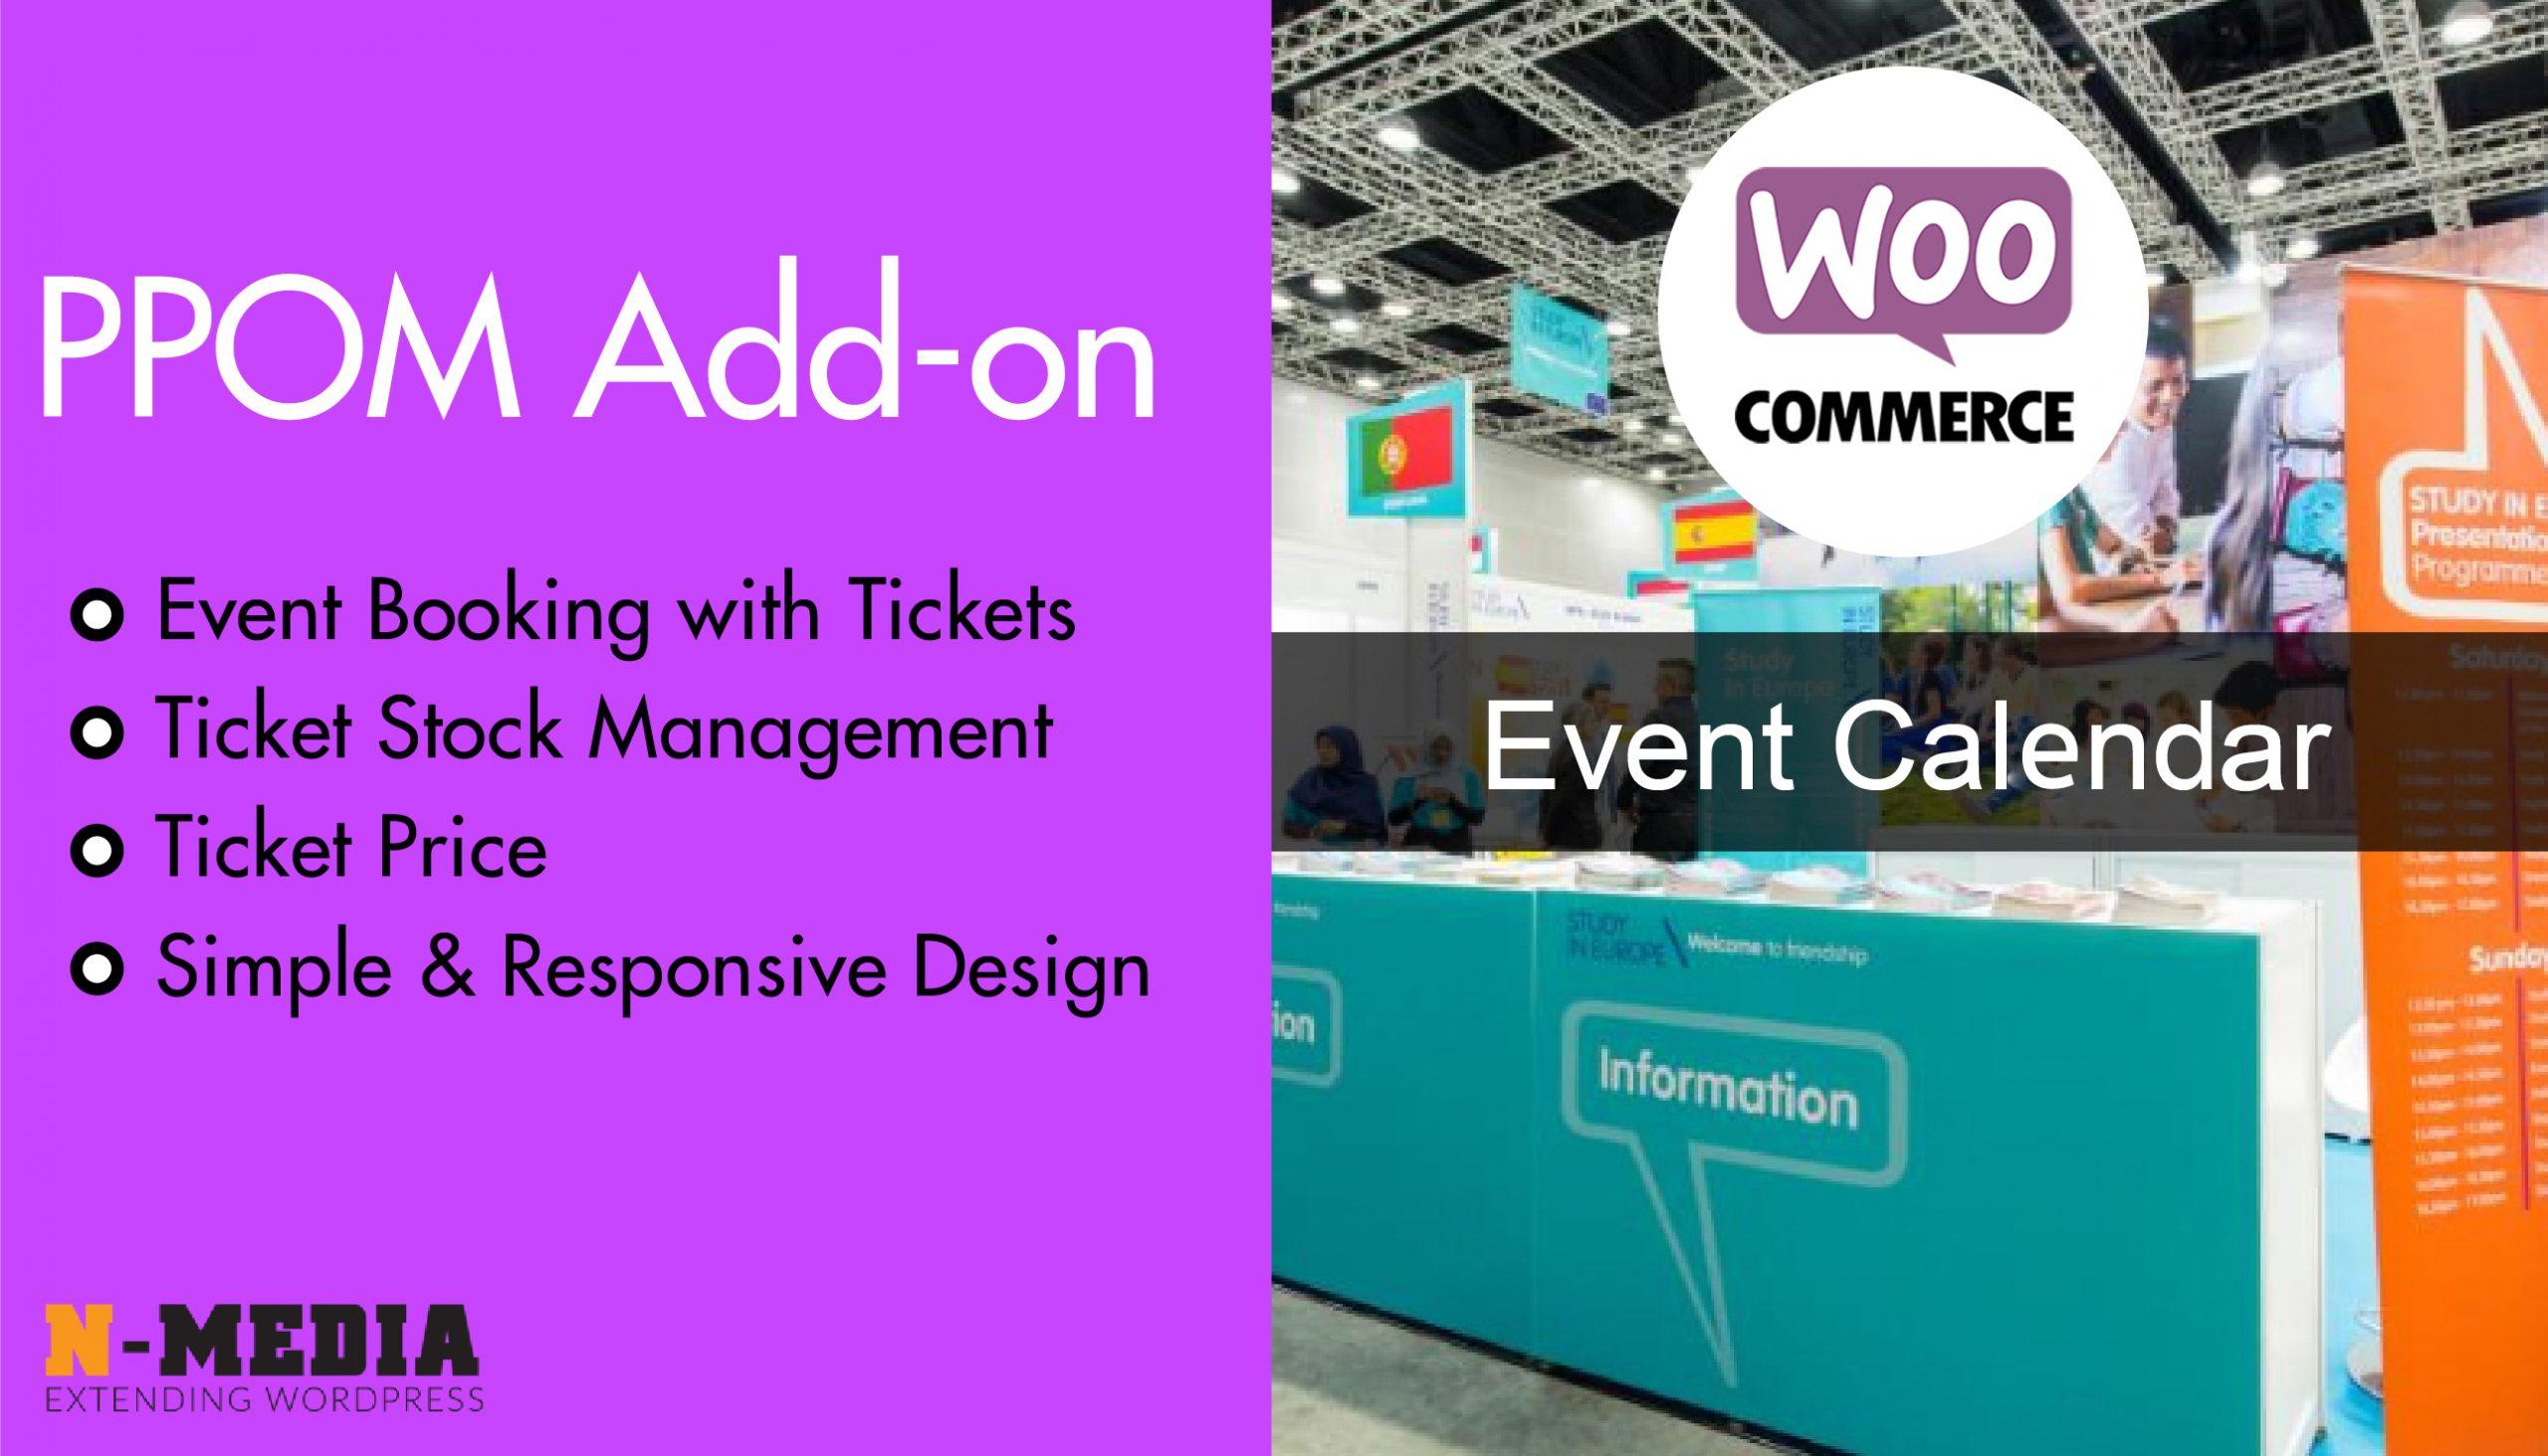 WooCommerce Event Calendar – PPOM Add-on